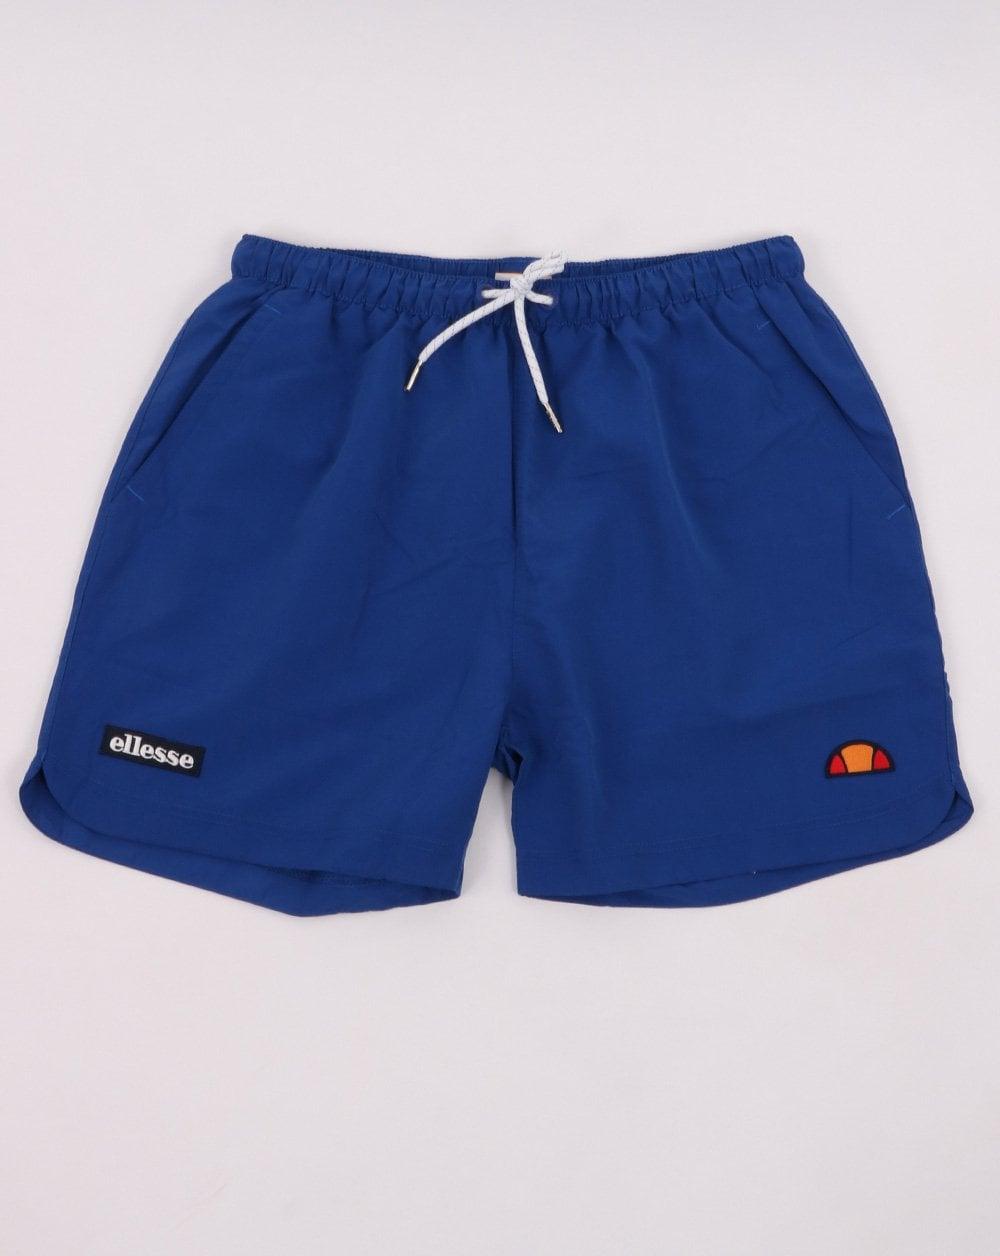 22d9d1c5ba Ellesse Verdo Swim Shorts in Royal Blue | 80s Casual Classics